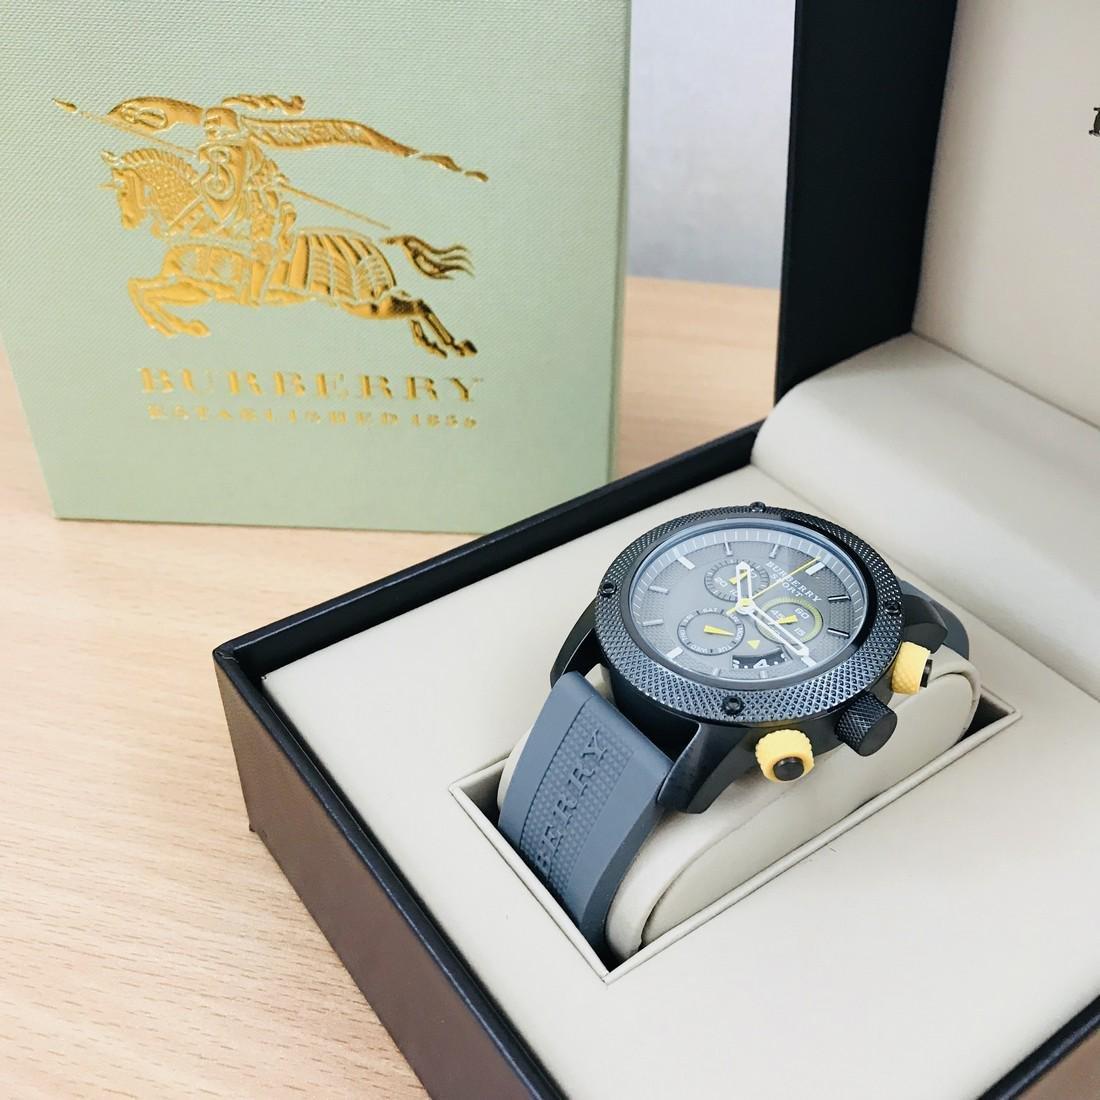 Burberry Endurance Swiss Made Men's Chronograph Watch - 2